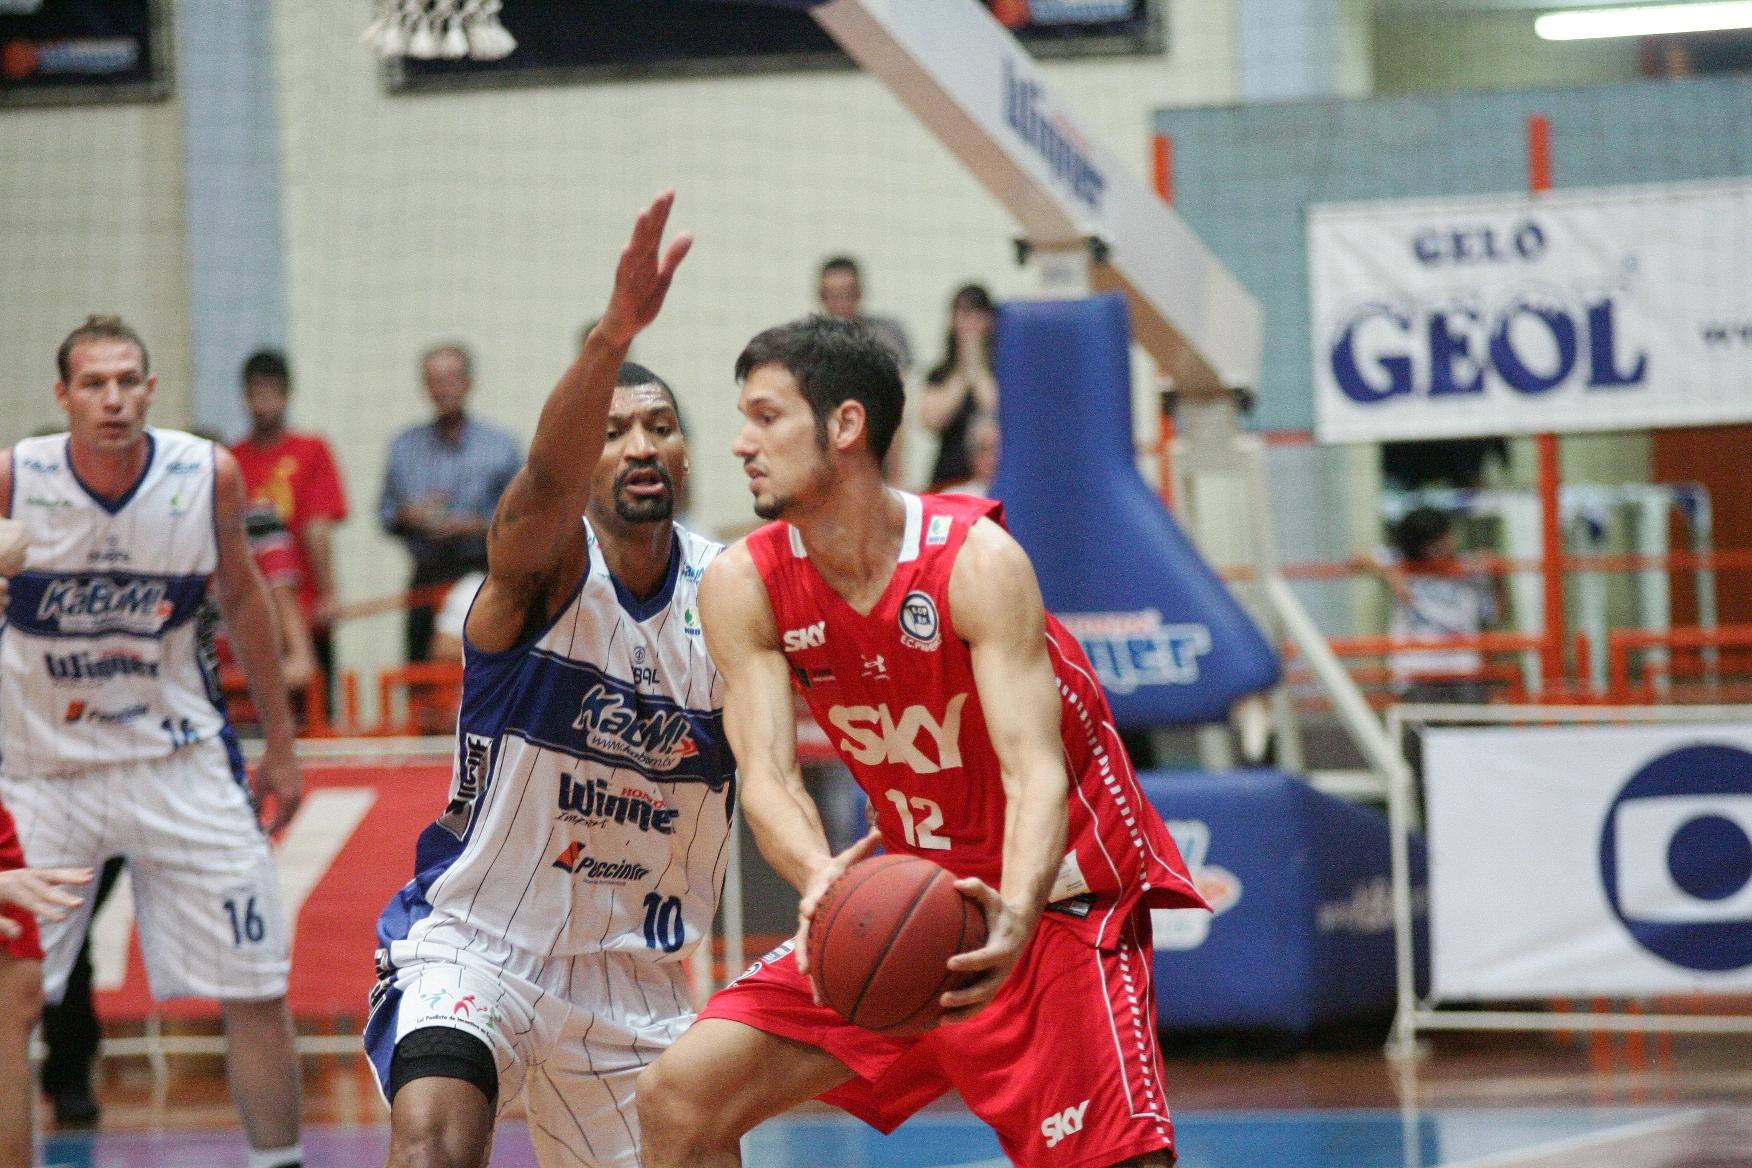 Rafael Mineiro, do Pinheiros, e Leandro, do Limeira